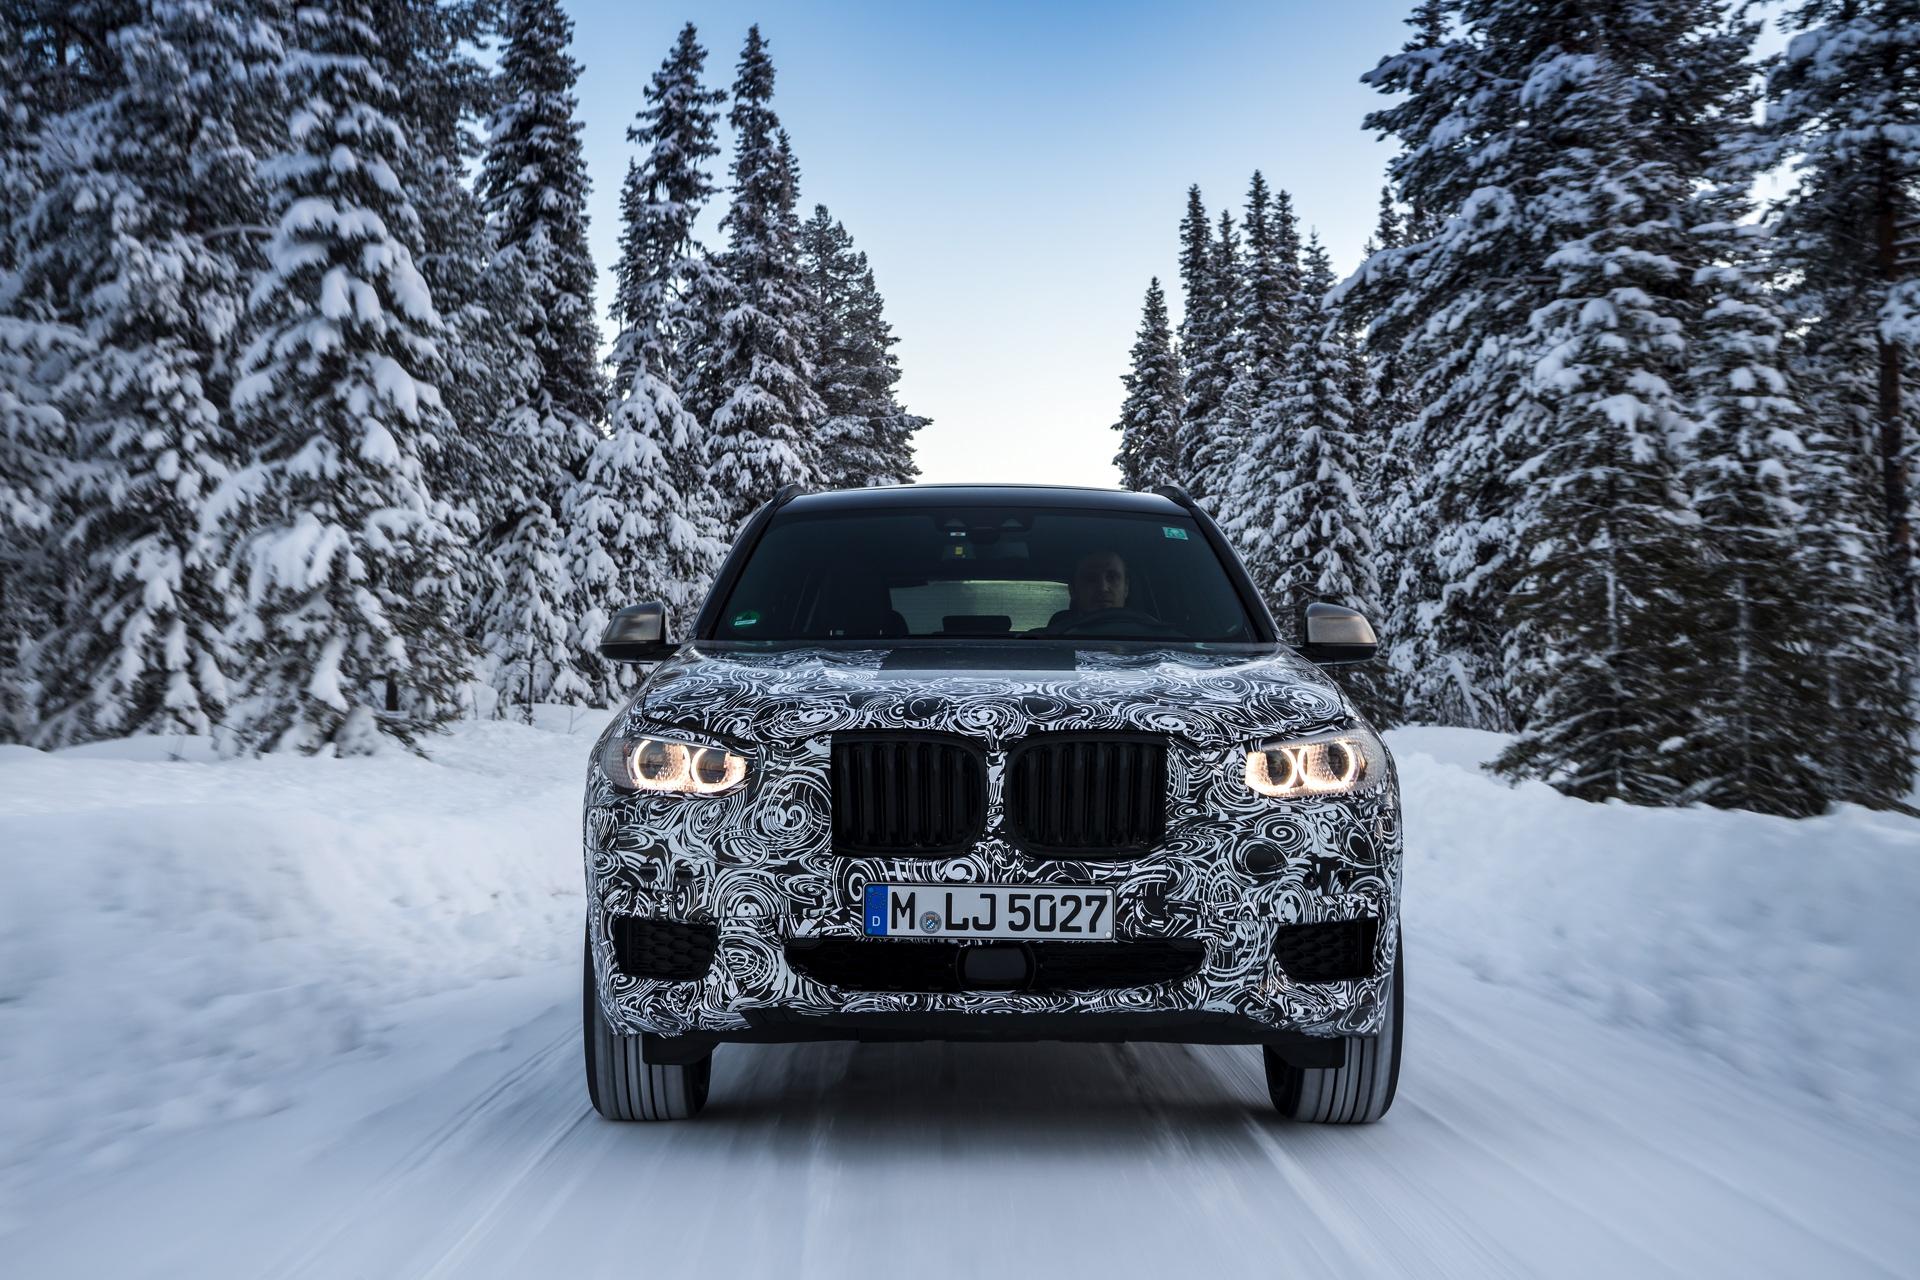 2017 BMW X3 winter testing 05